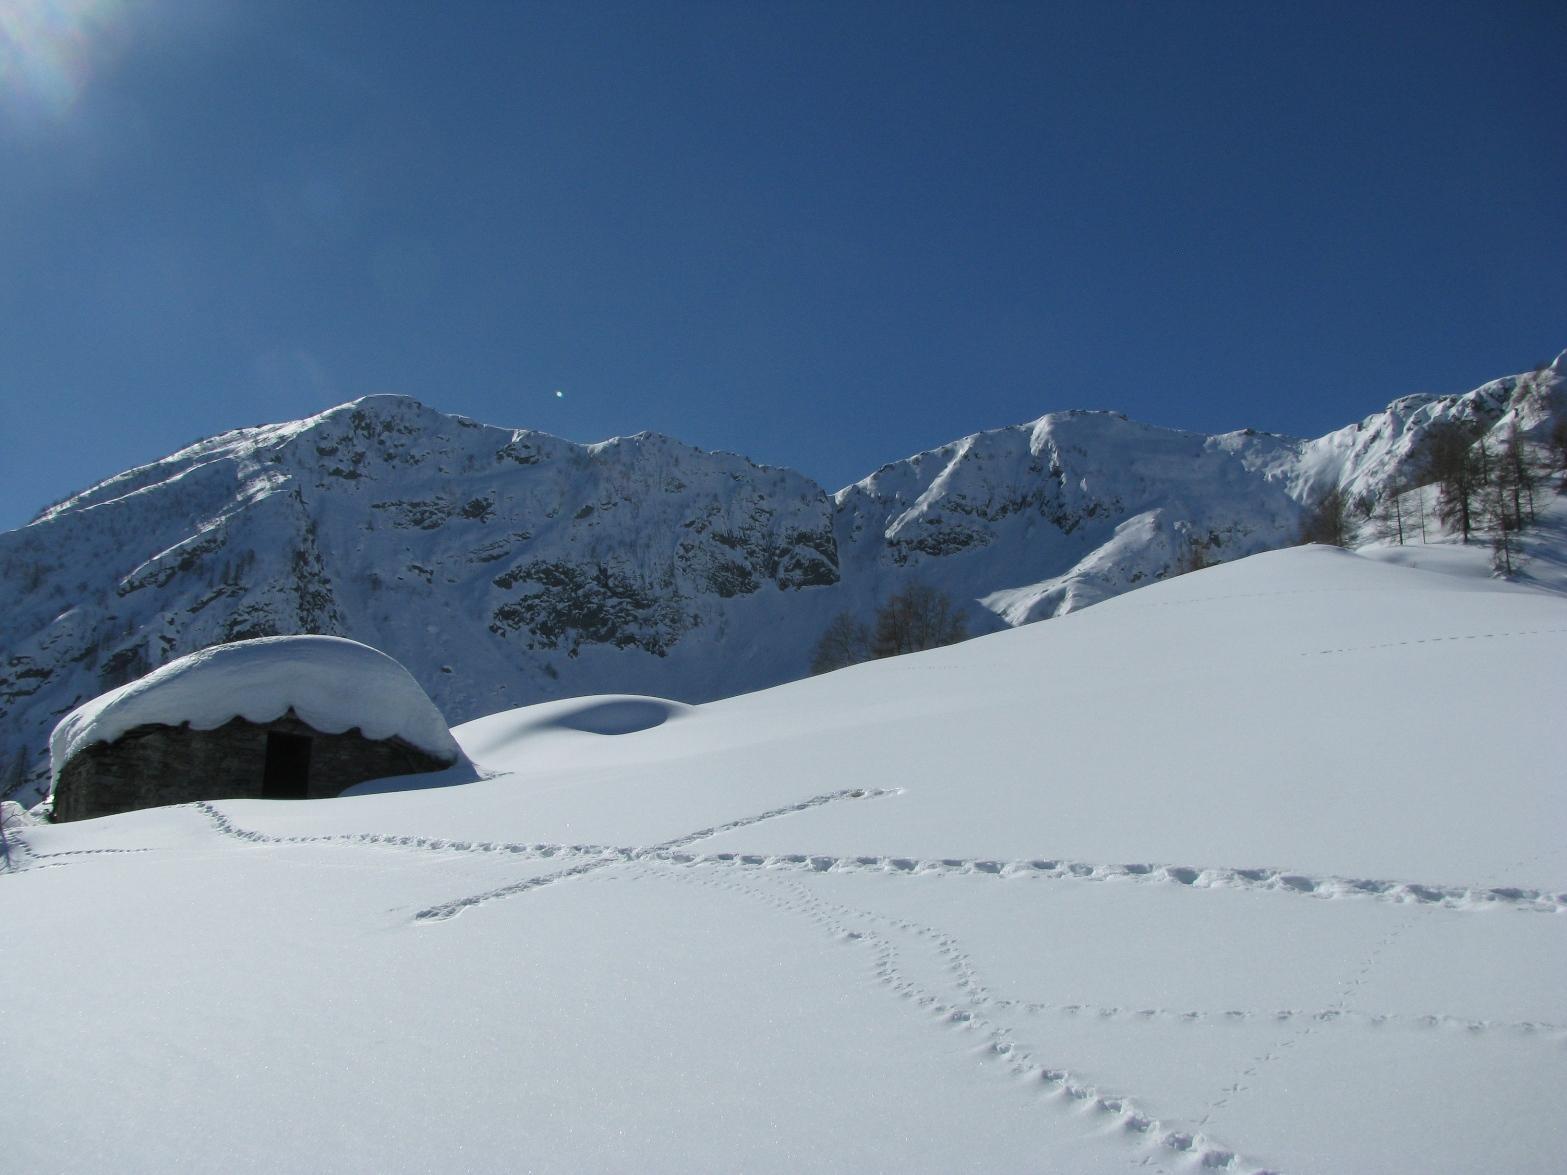 Arrivo all'Alpe Traverse